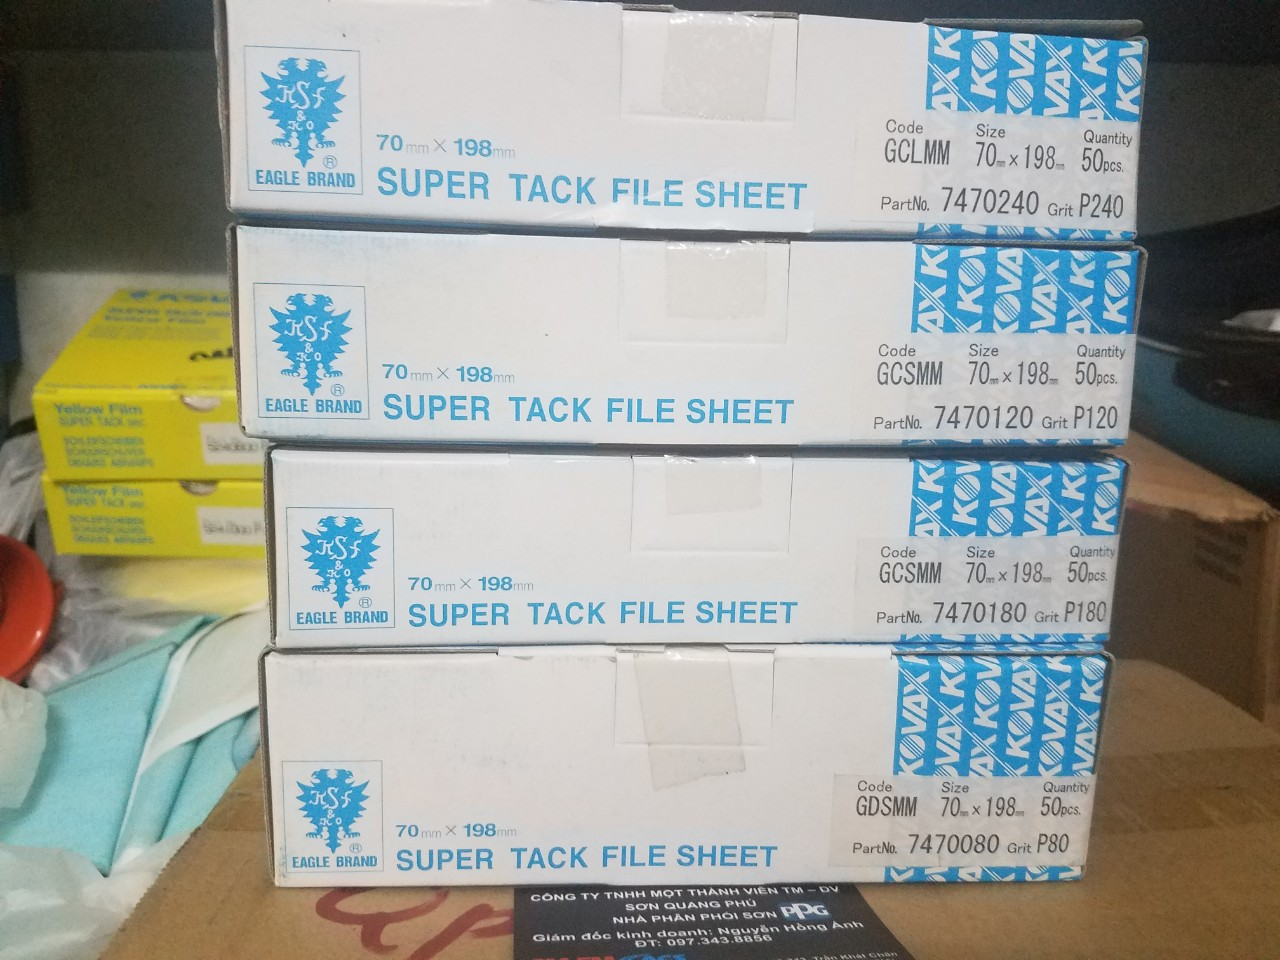 giay-nham-cha-kho-chu-nhat-kovax-premium-super-tack-file-sheet-70x198mm-p80-p120